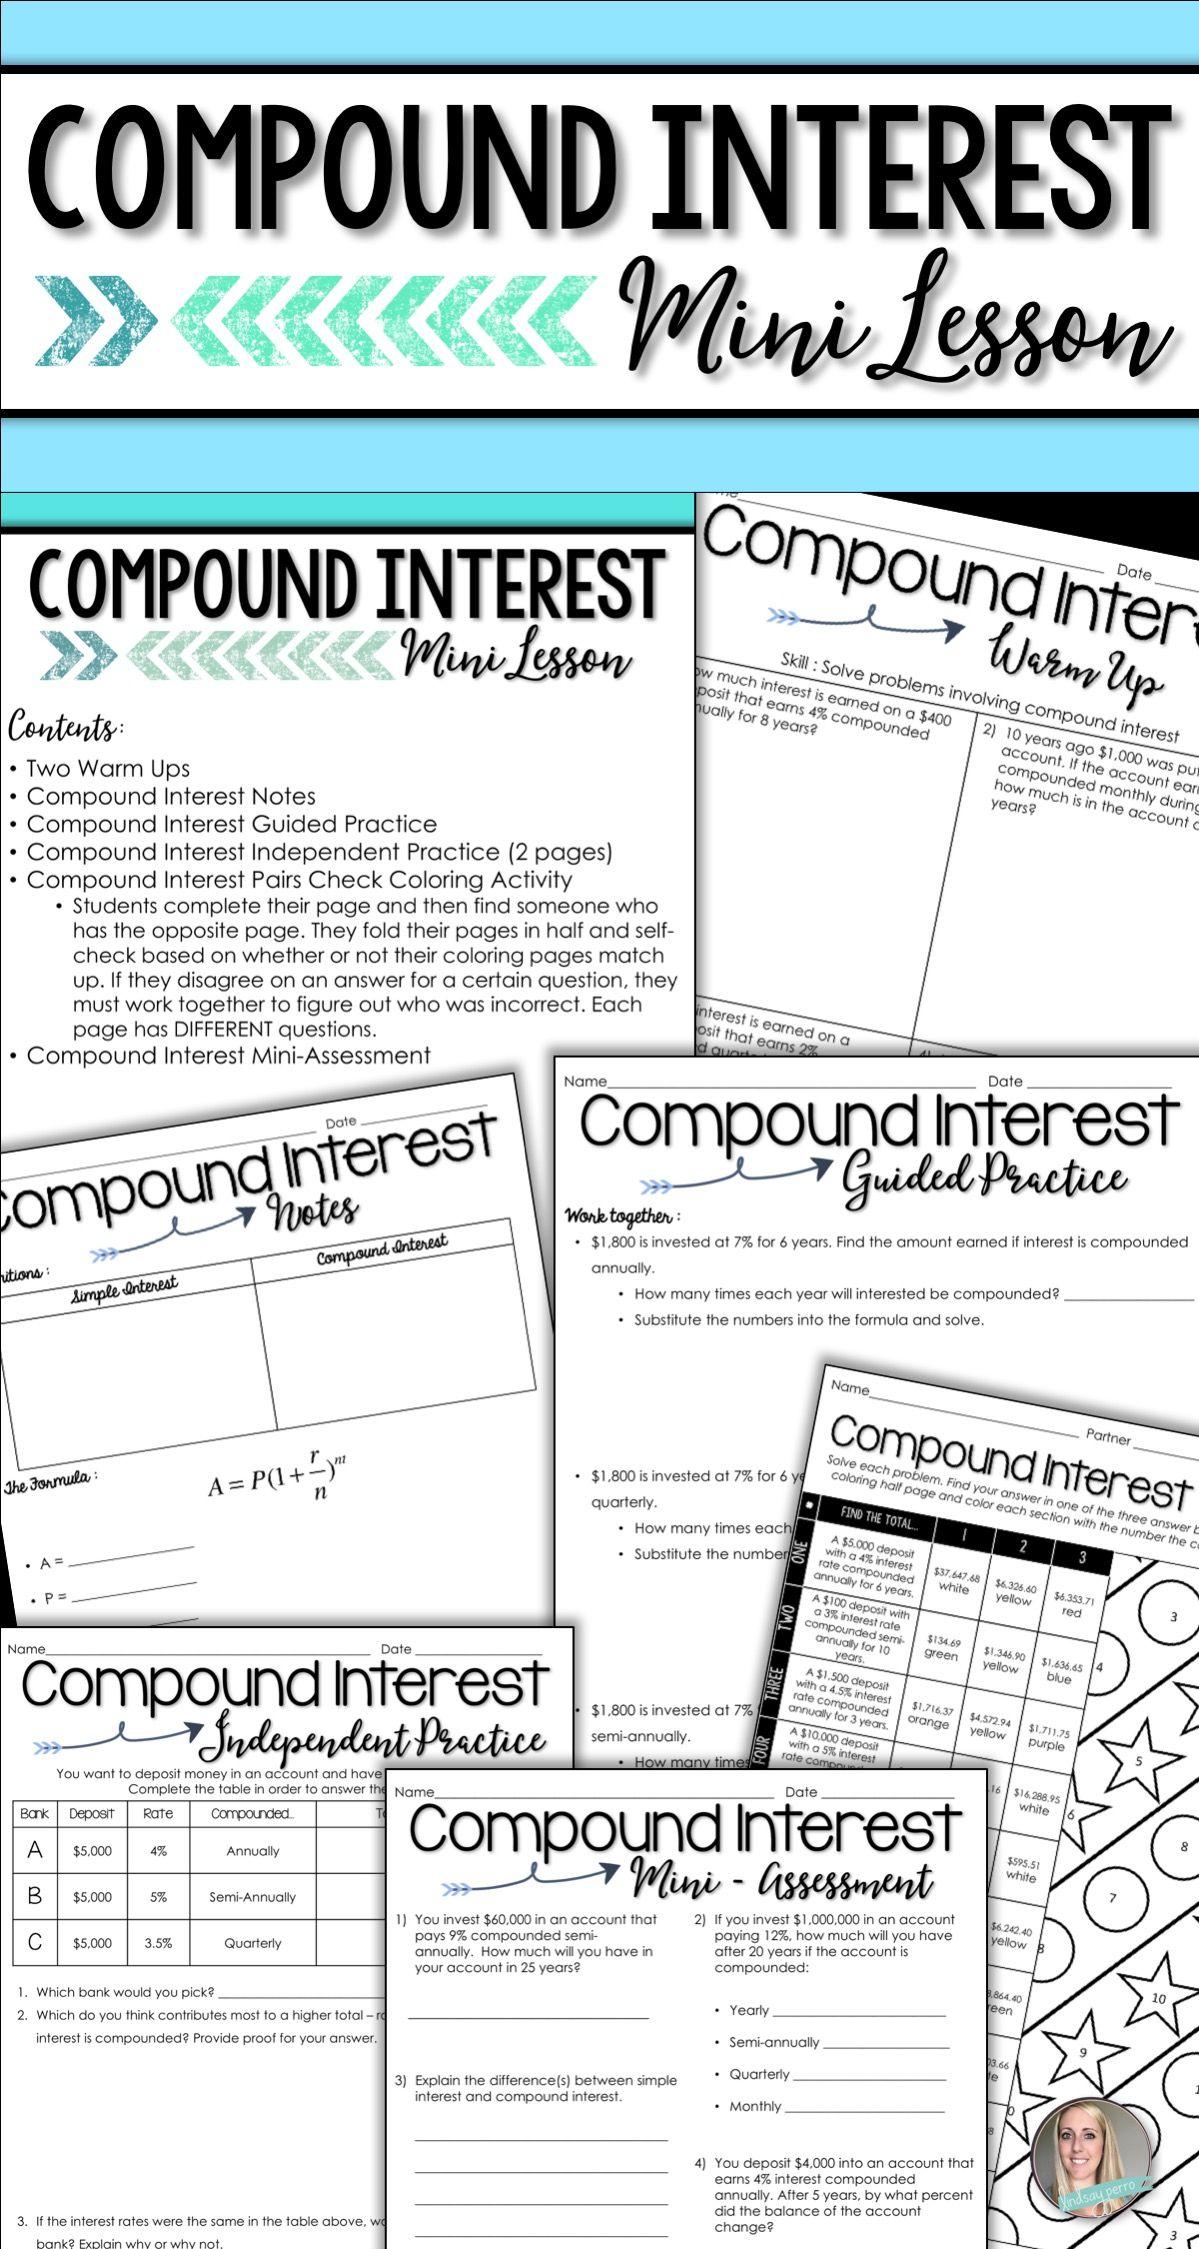 worksheet Compound Interest Practice Worksheet compound interest mini lesson math activities and algebra lesson